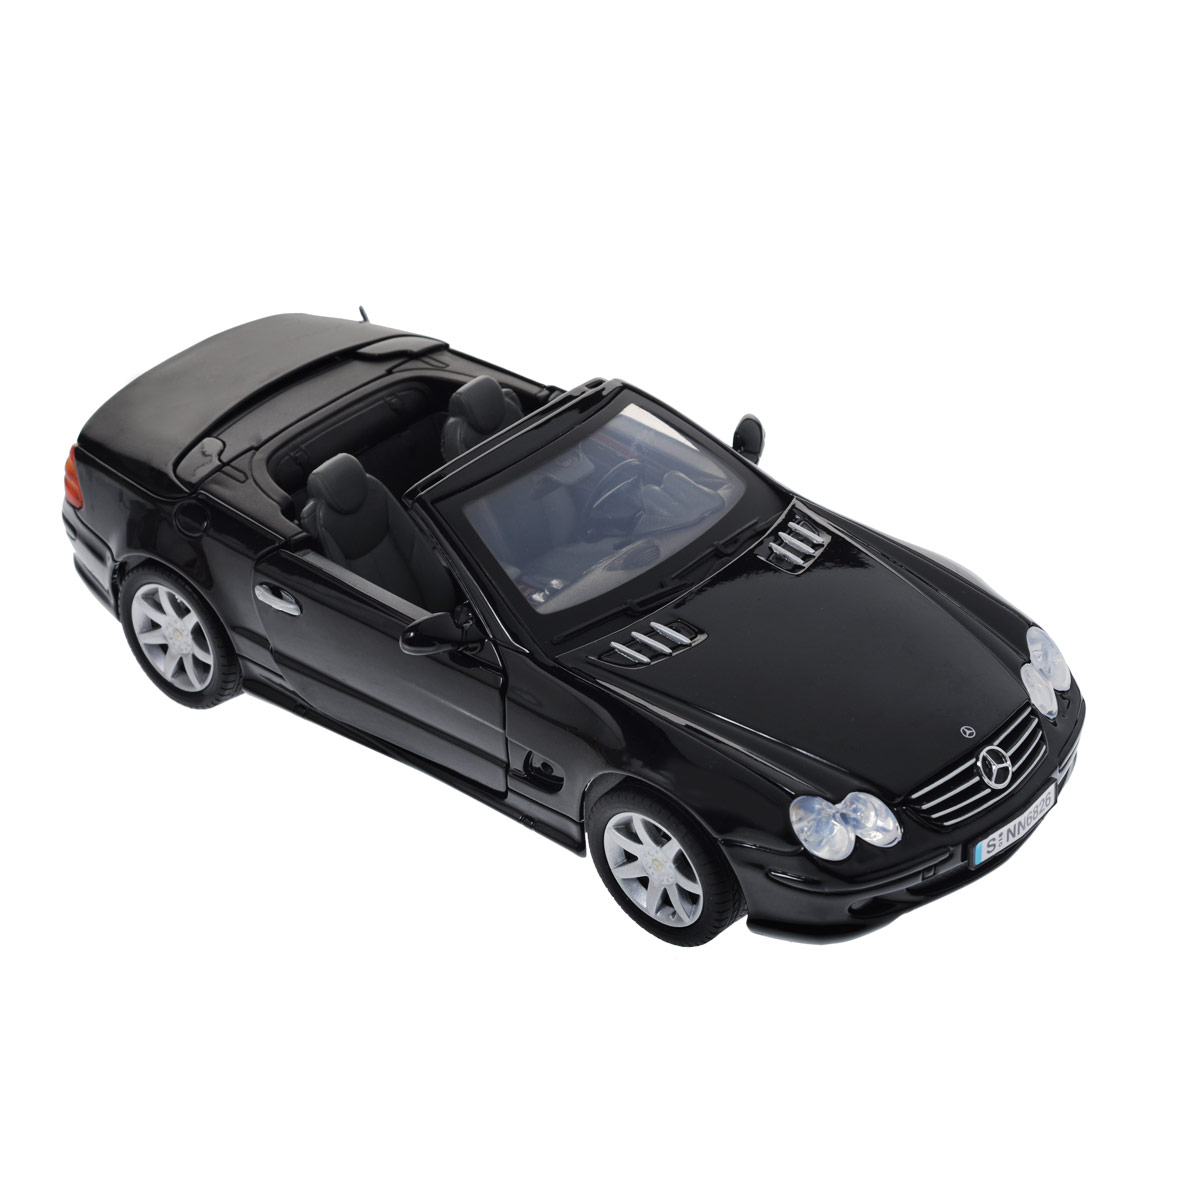 Autotime Коллекционная модель автомобиля Mercedes Benz SL500, цвет: черный. Масштаб 1/18 welly mercedes benz sl500 1 18